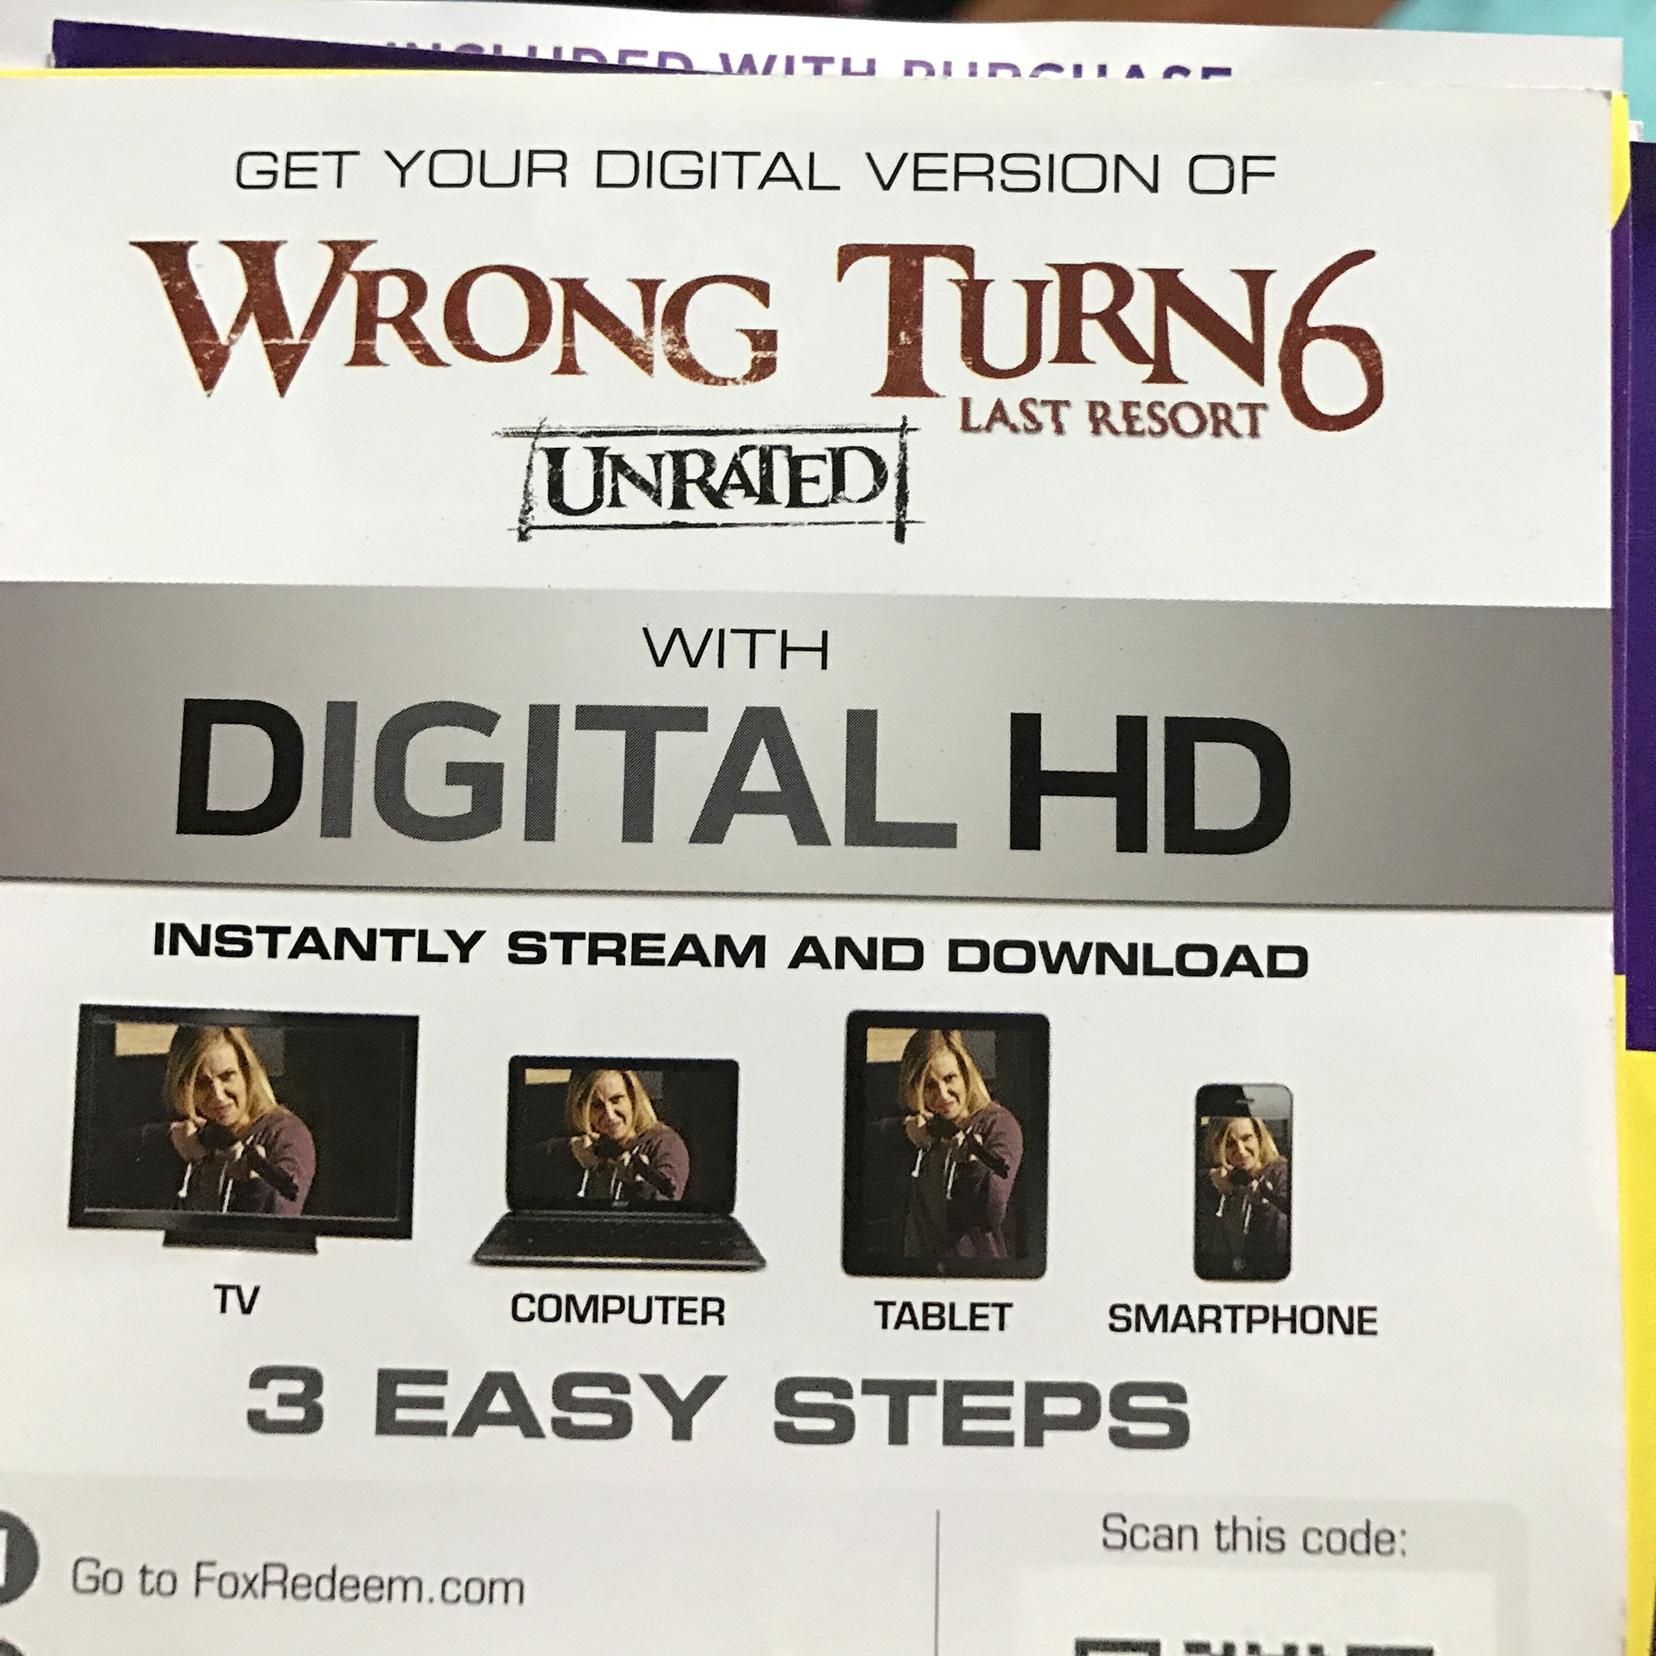 Wrong Turn 6 Last Resort HD digital download Foxredeem us only